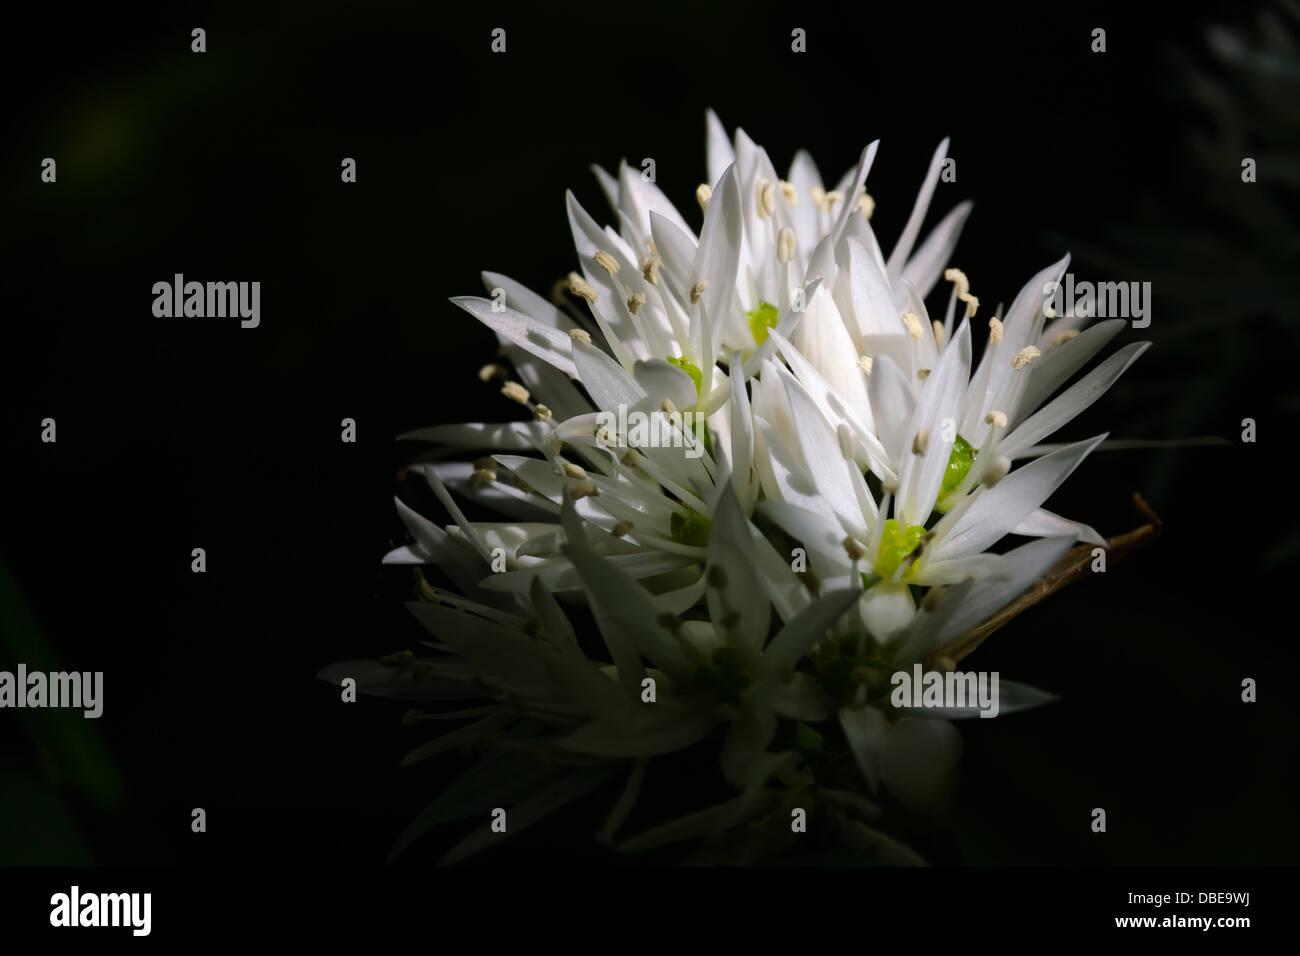 Sunlit white star shaped flowers Stock Photo